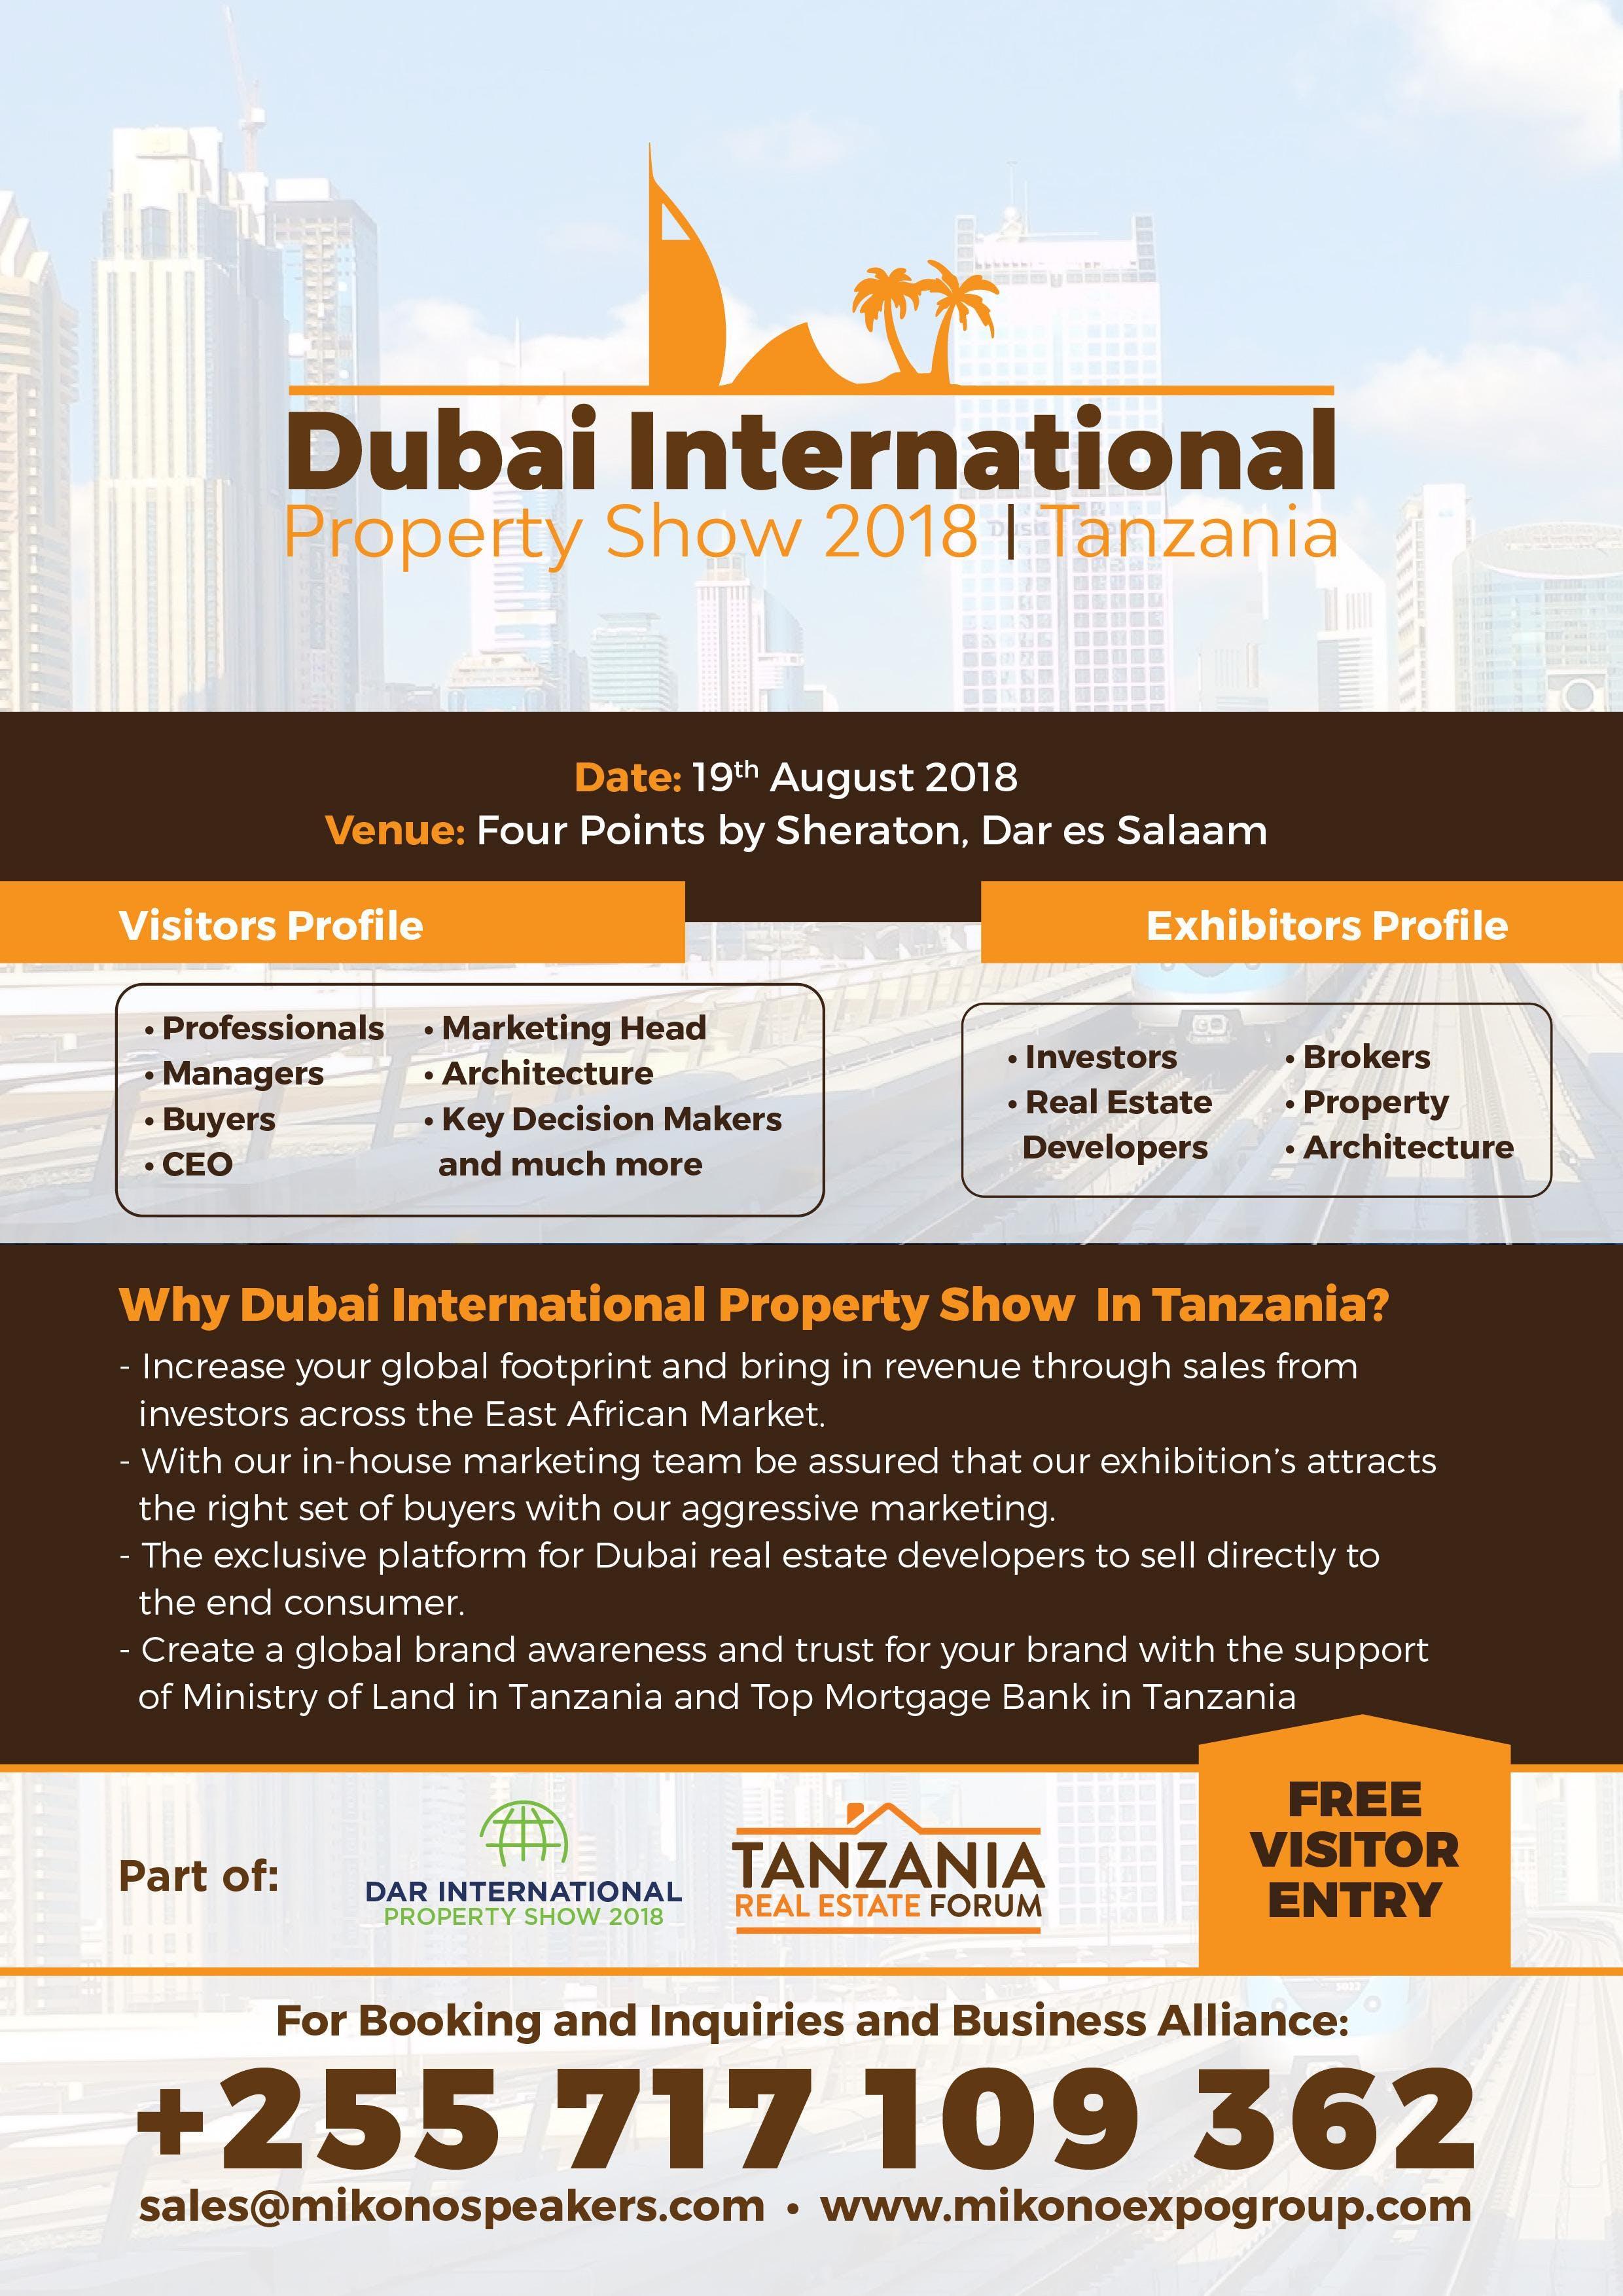 Dubai International Property show 2018Tanzania